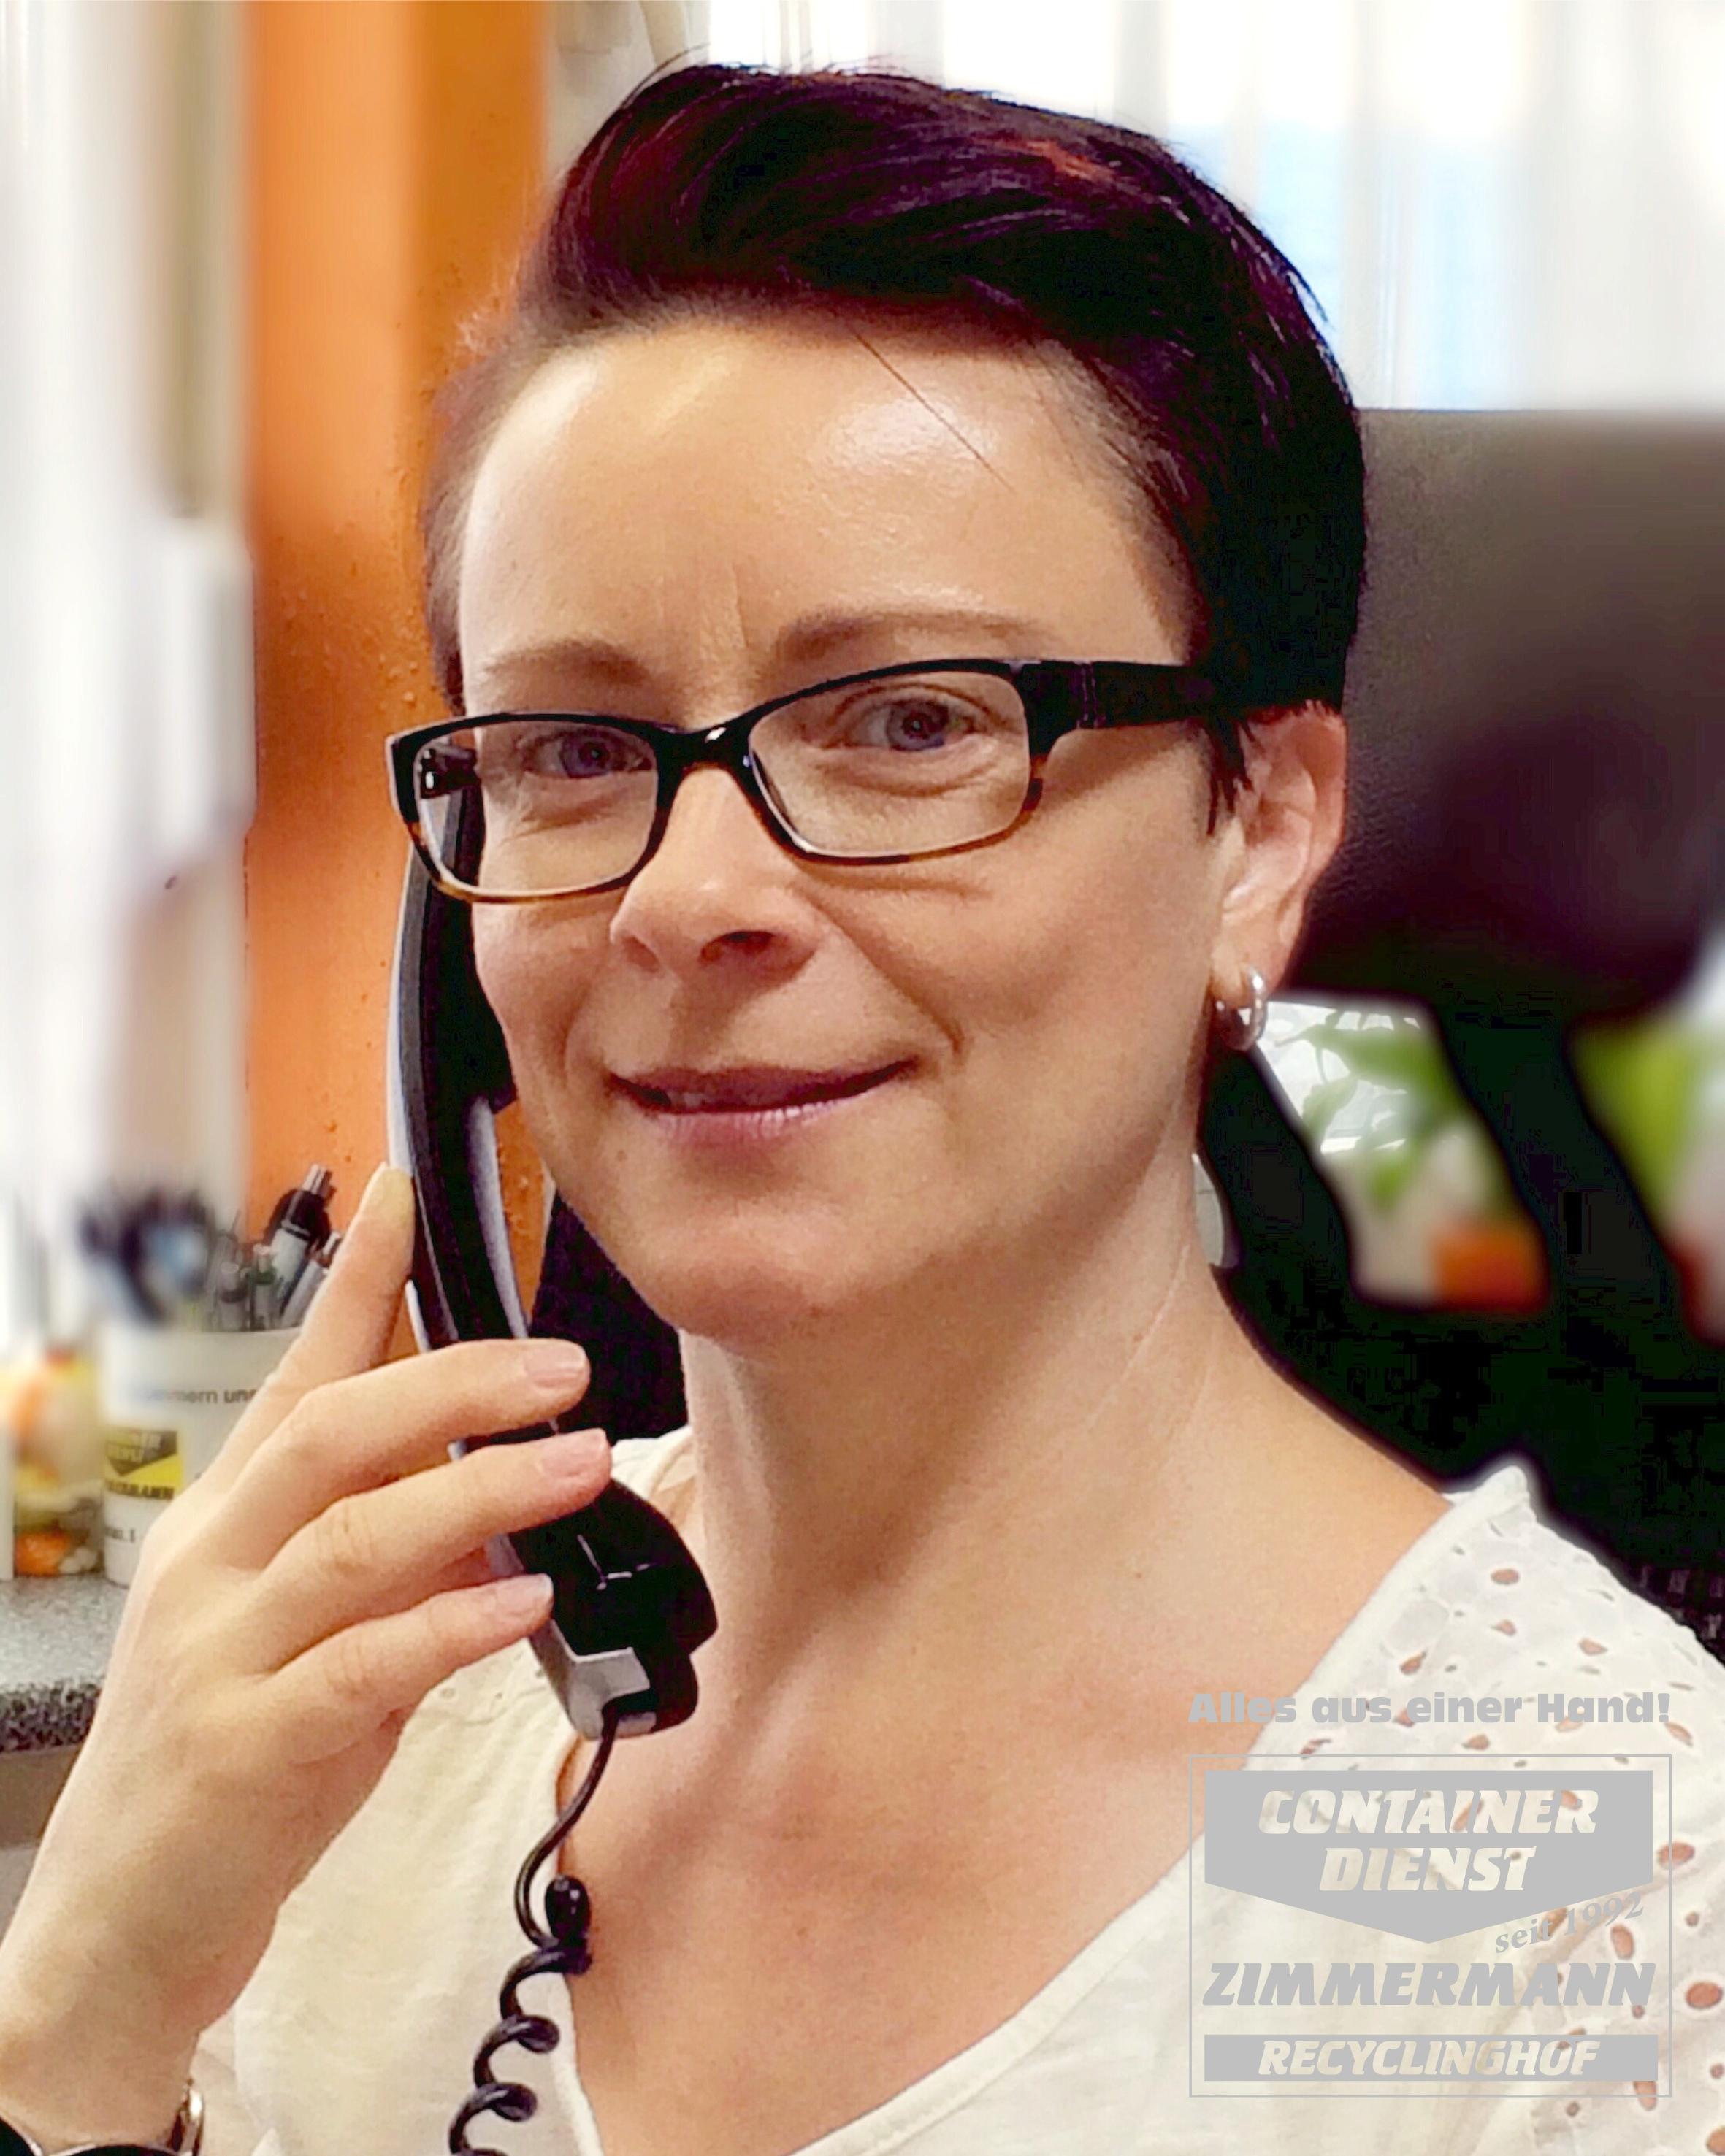 Mandy Raßloff